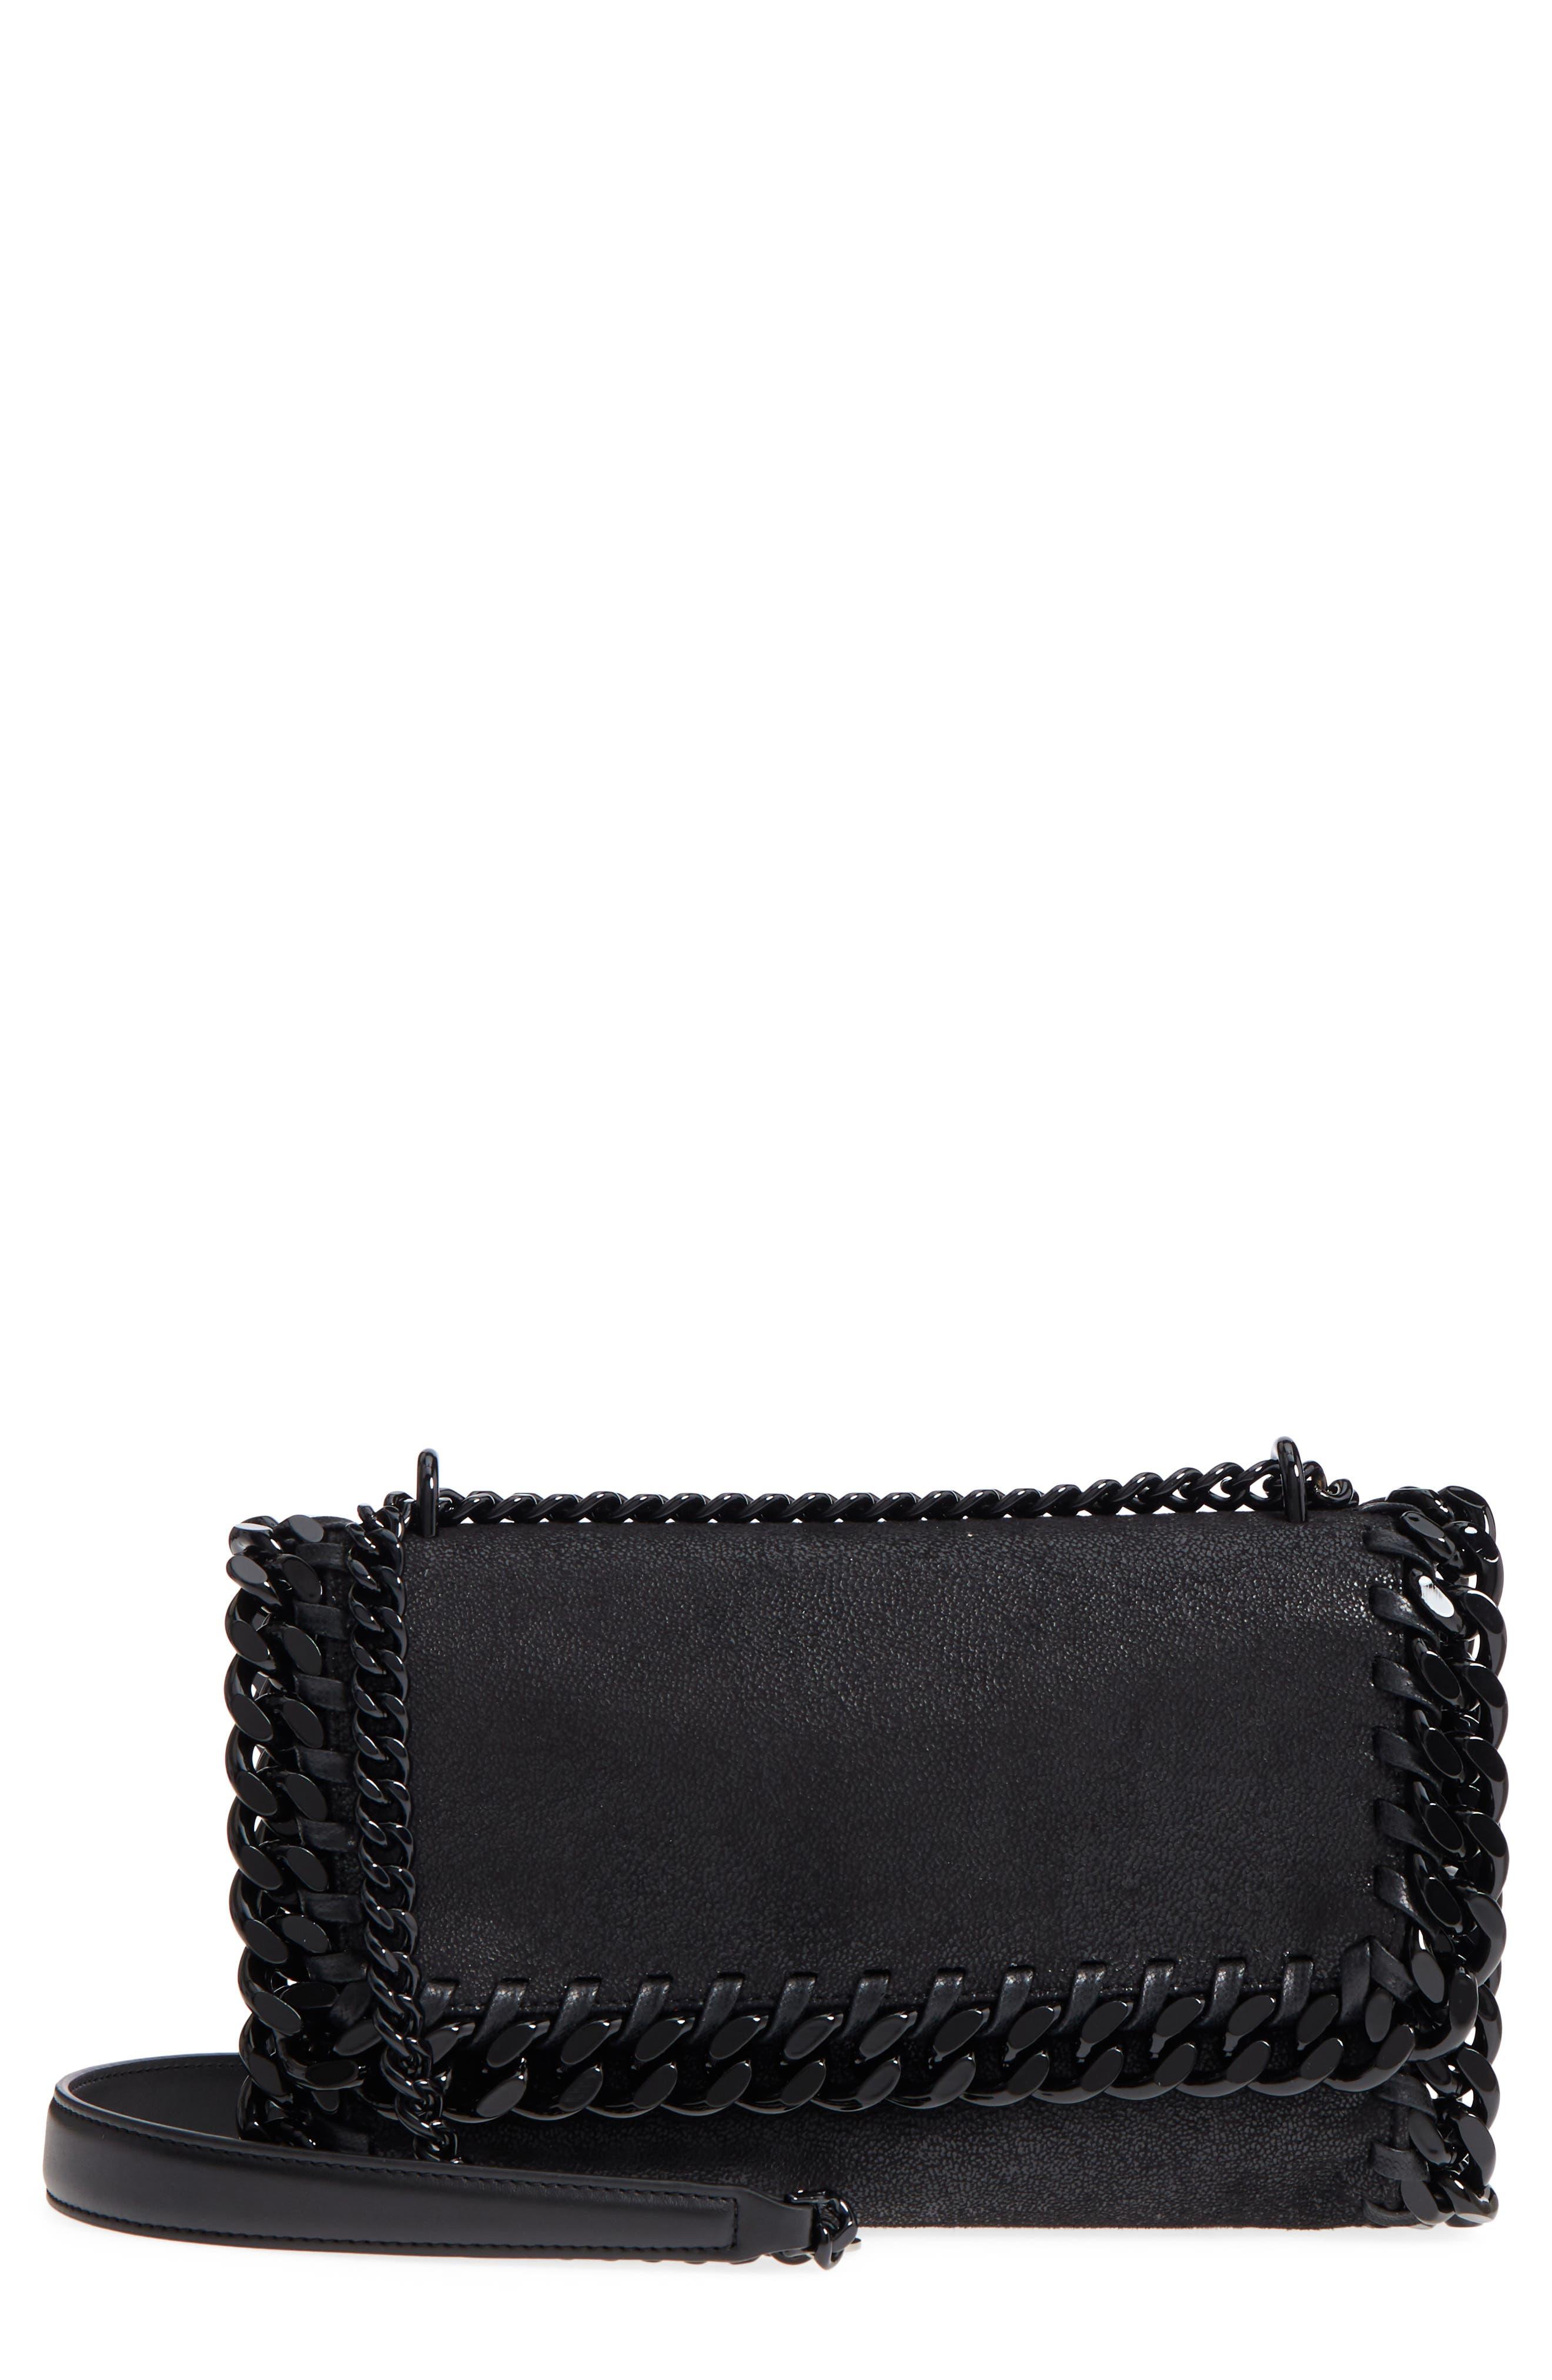 Falabella Shaggy Deer Faux Leather Shoulder Bag,                             Main thumbnail 1, color,                             001